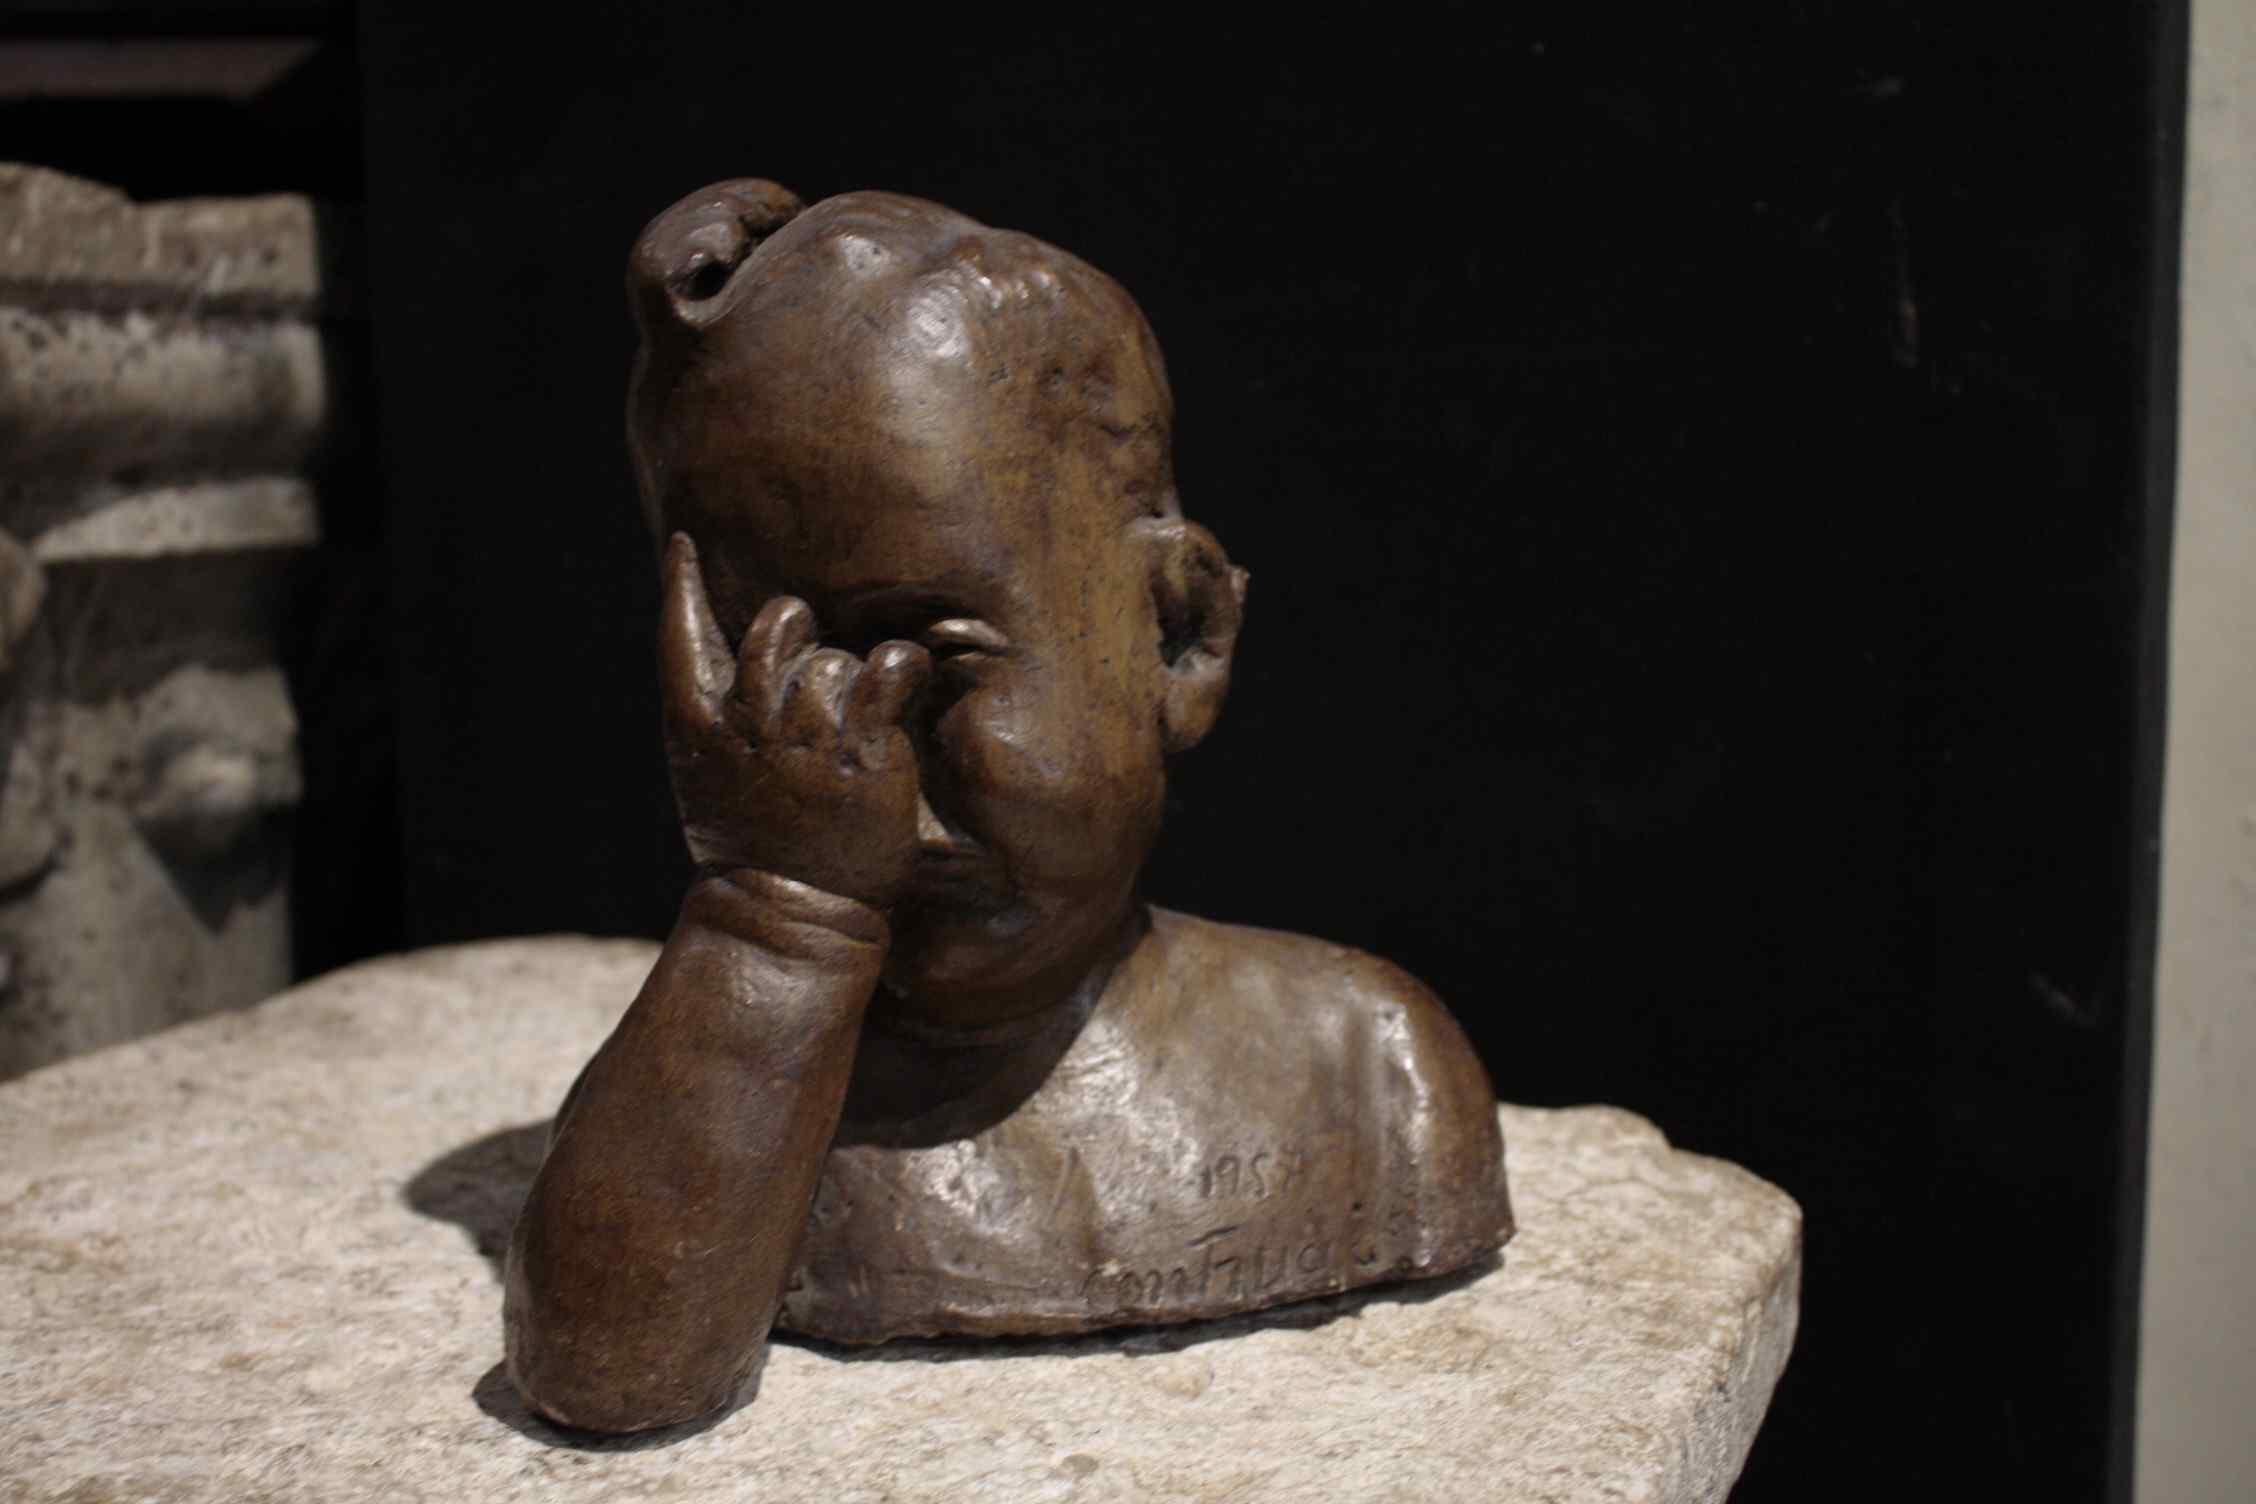 Bronze terracotta sculpture